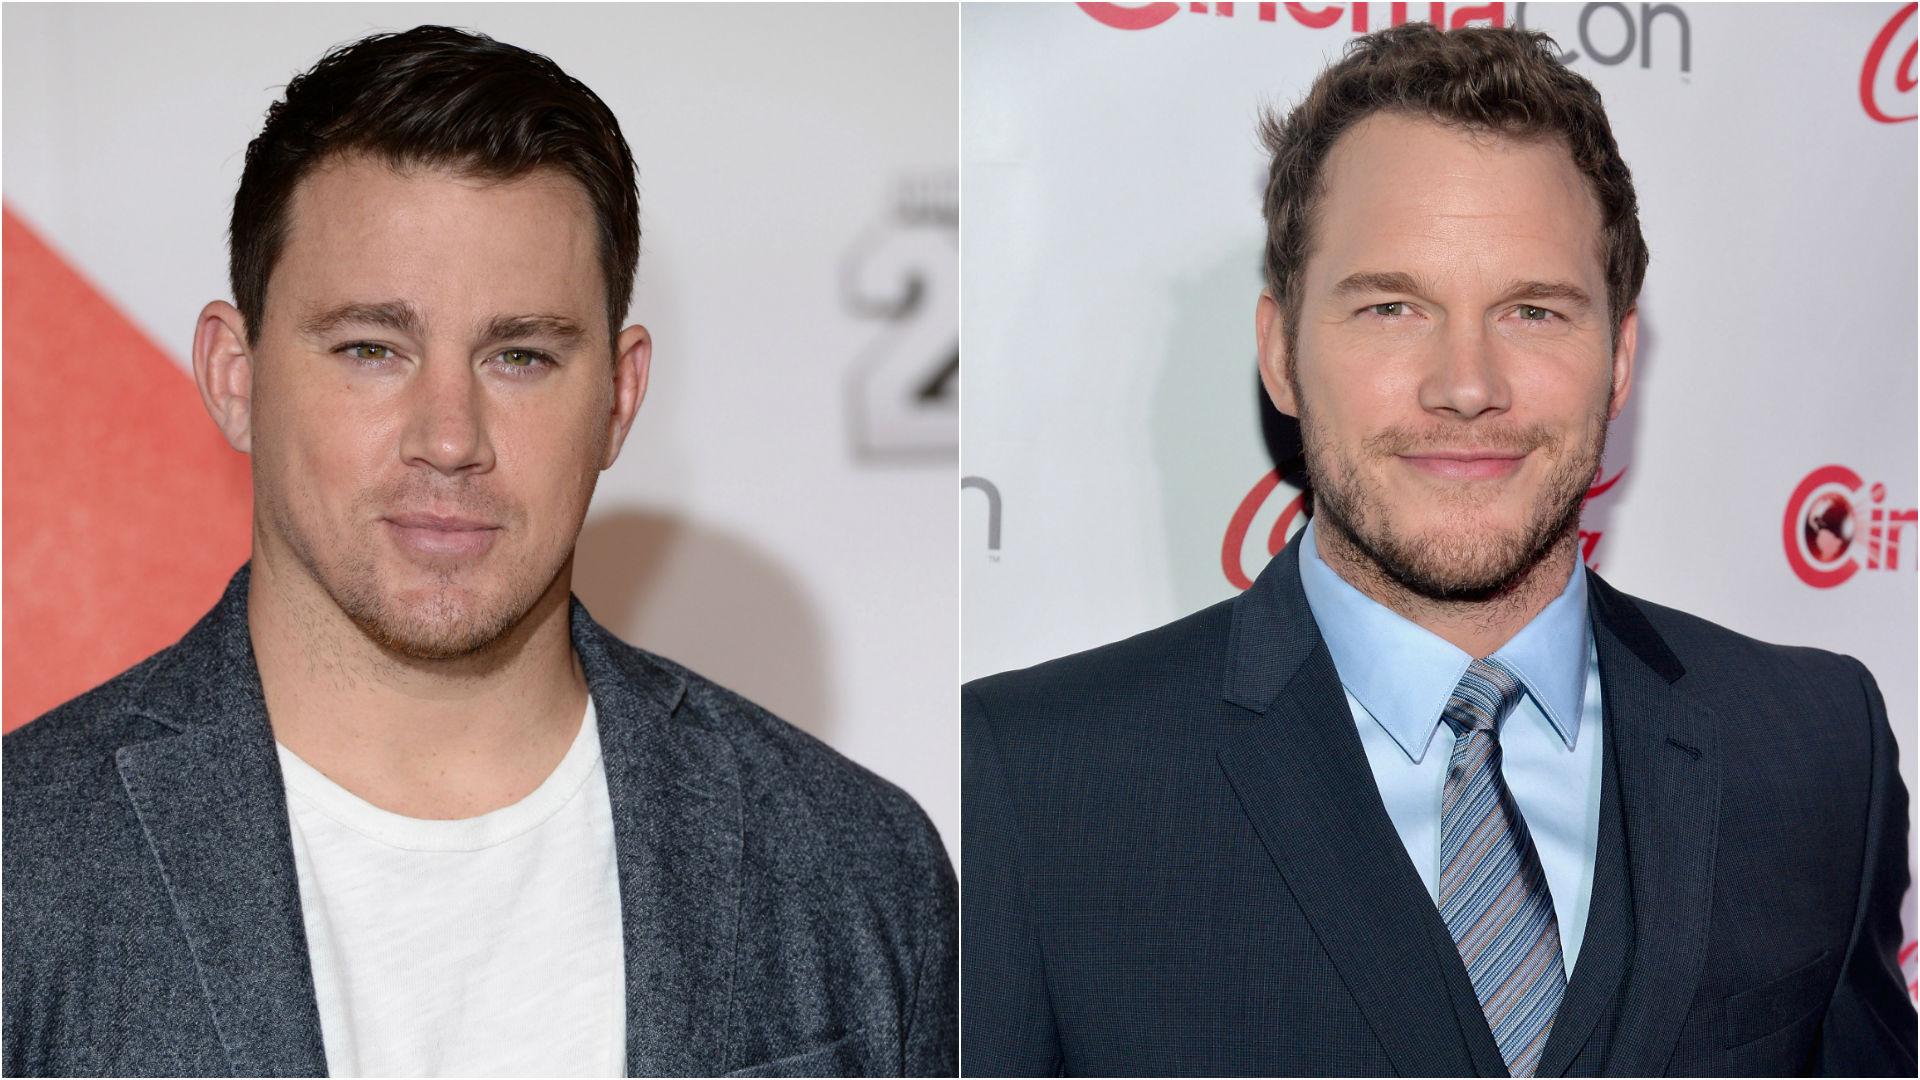 Channing Tatum vs Chris Pratt